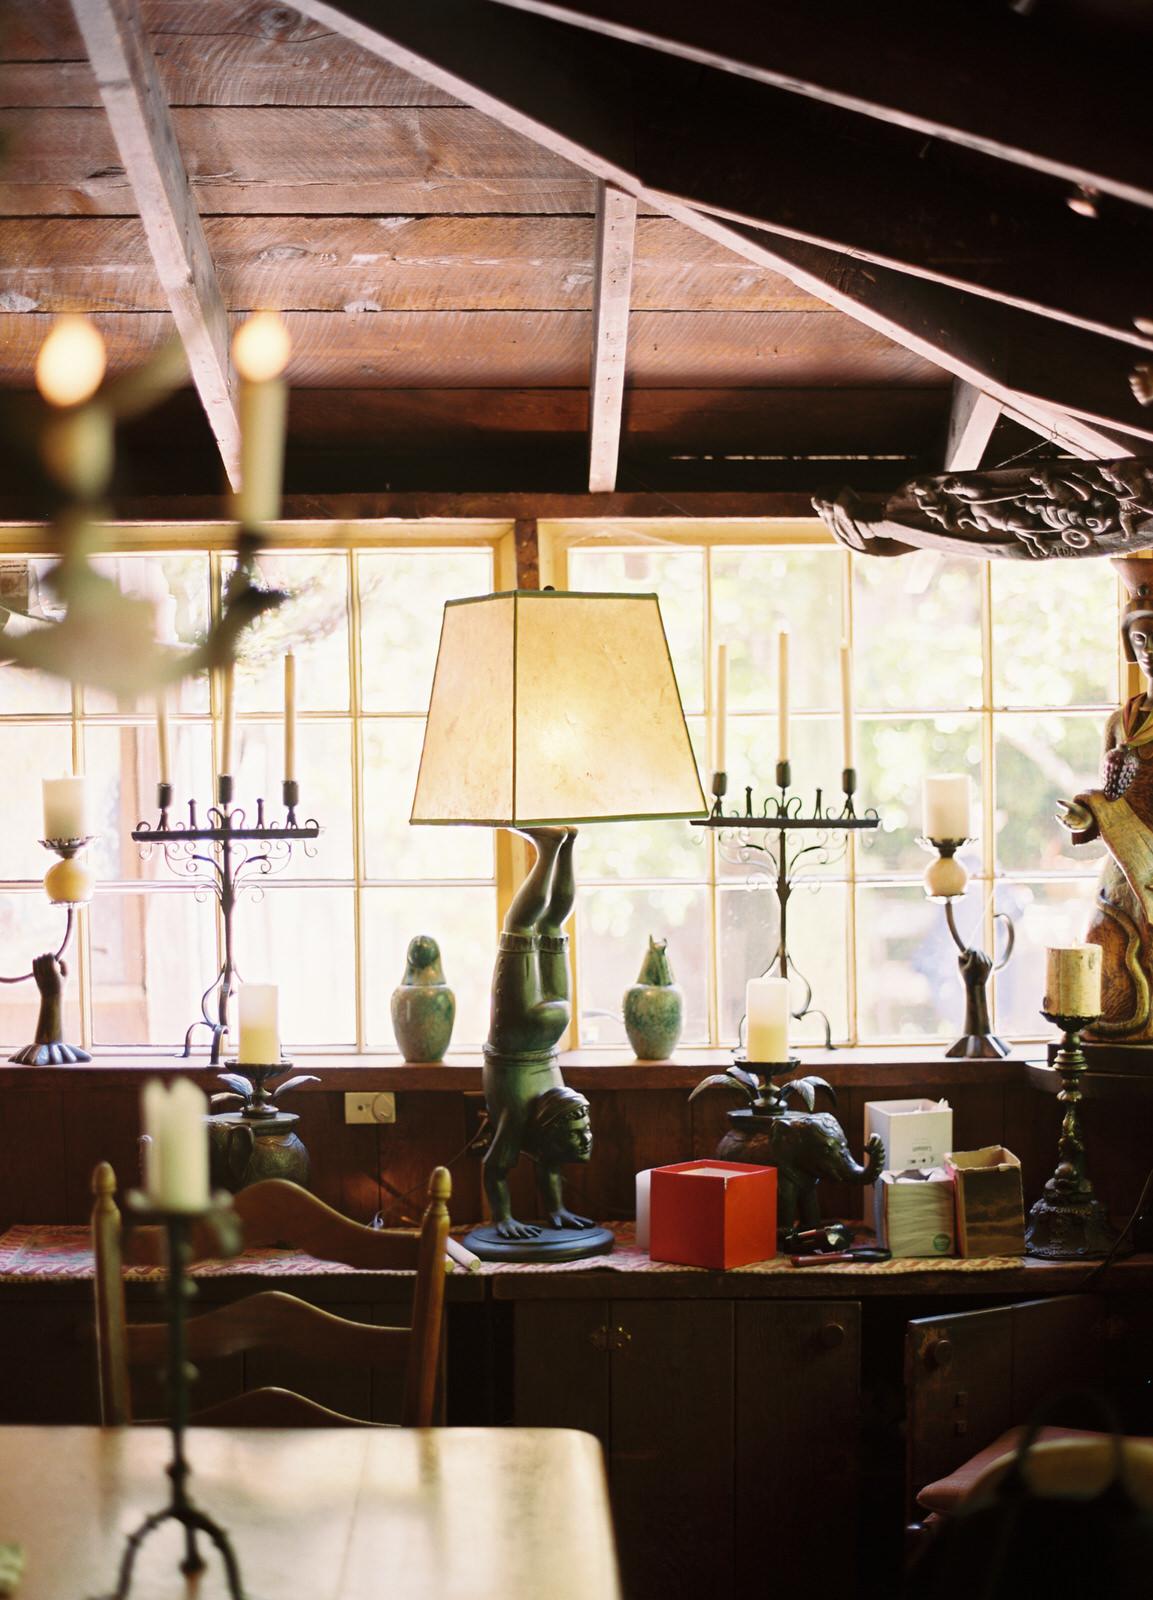 Deetjen's Big Sur Inn, Big Sur, Justin Chung, Kodak